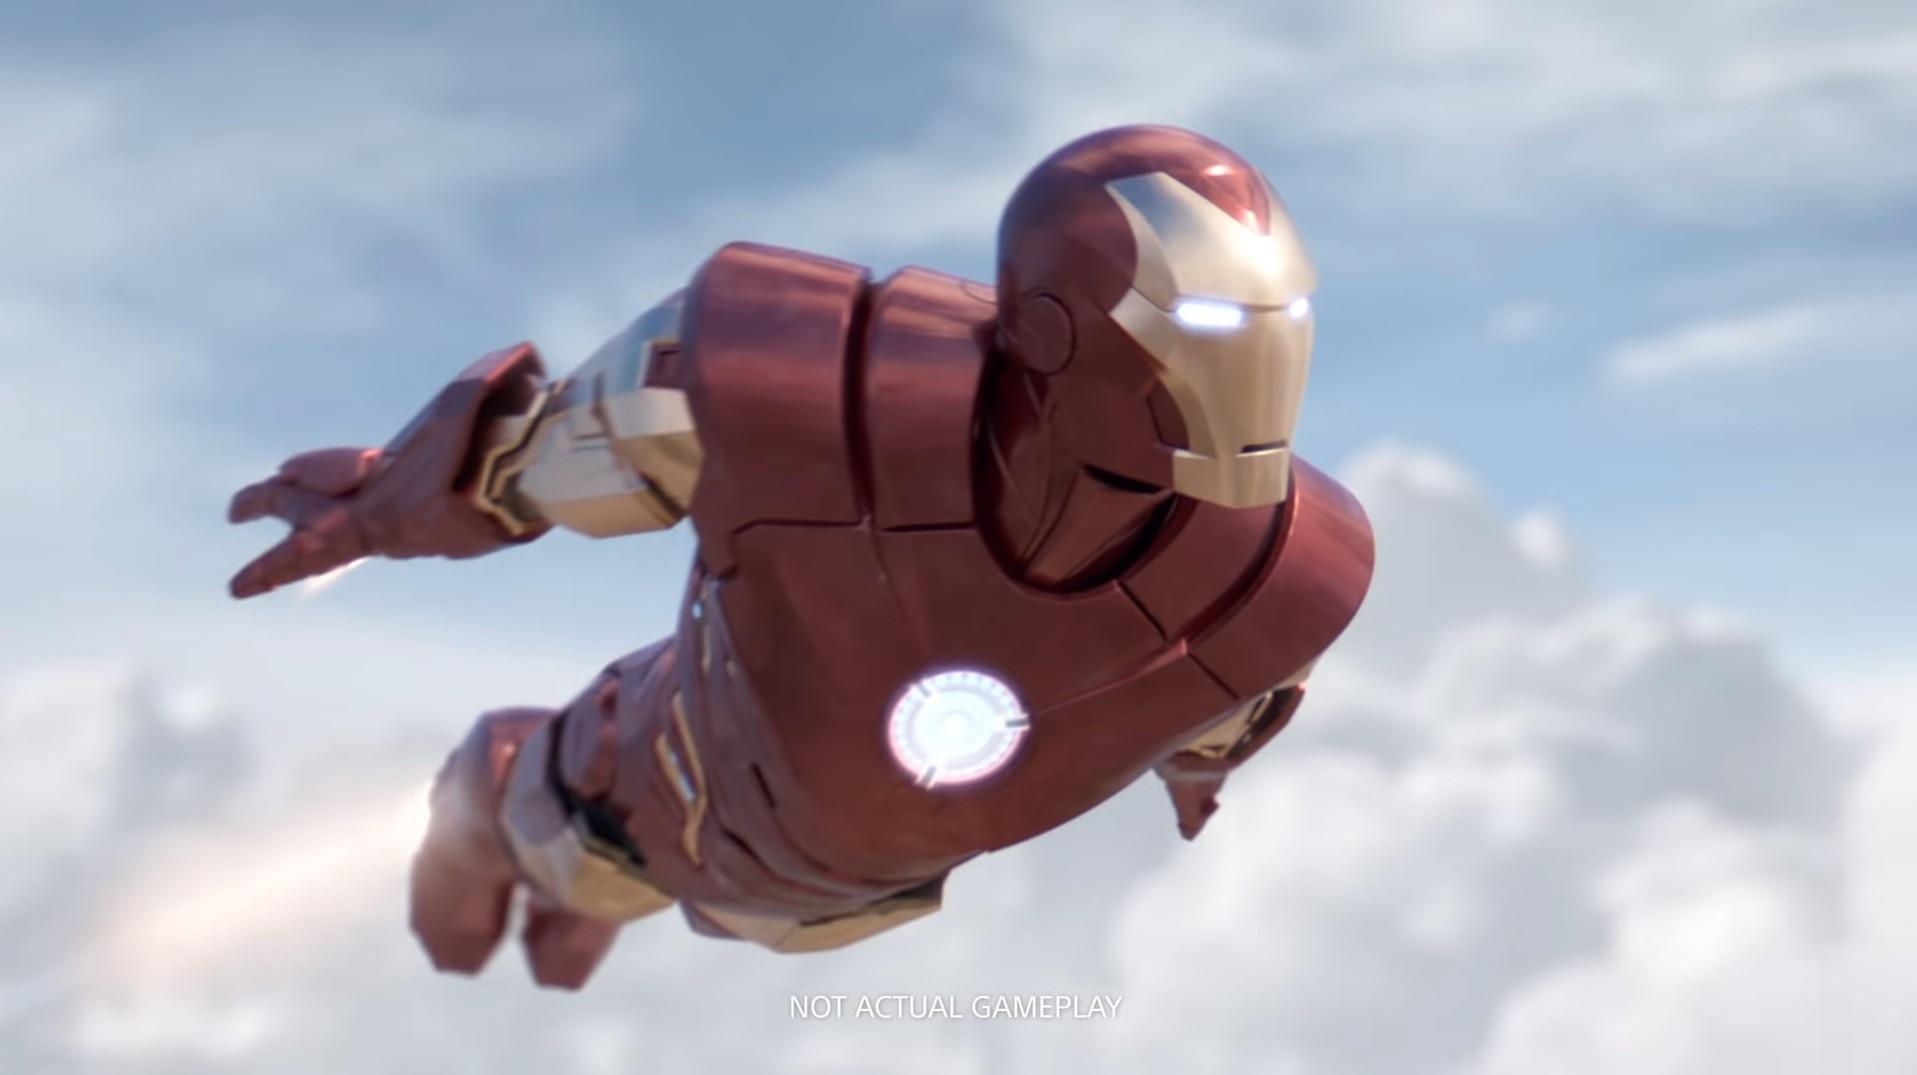 Sonha ser o Iron Man? A PlayStation quer dar-lhe a oportunidade